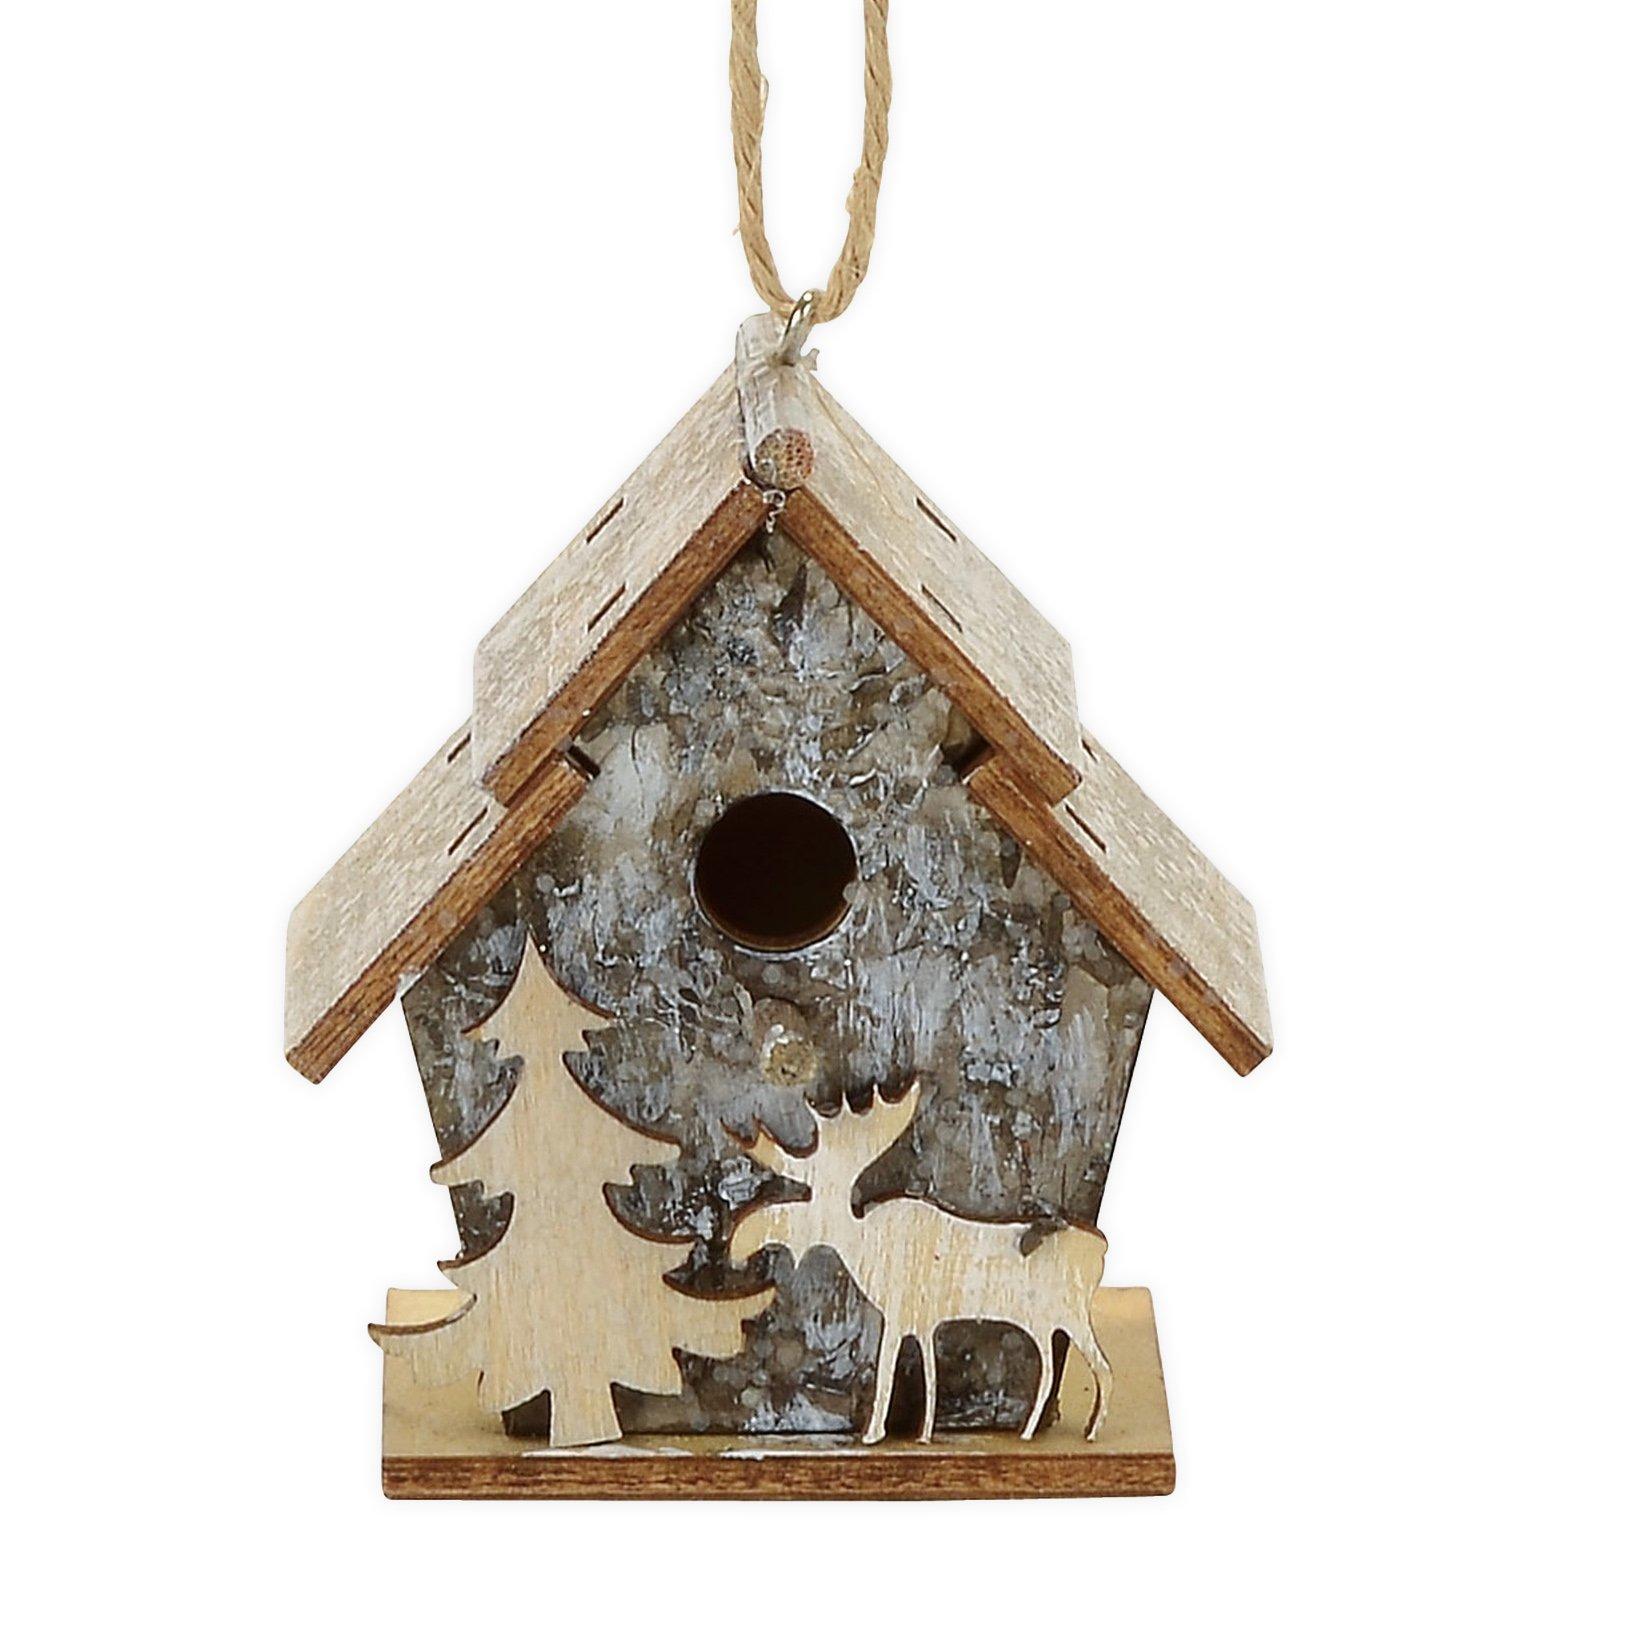 Department 56 Forest Favorites Birch Birdhouse Hanging Ornament